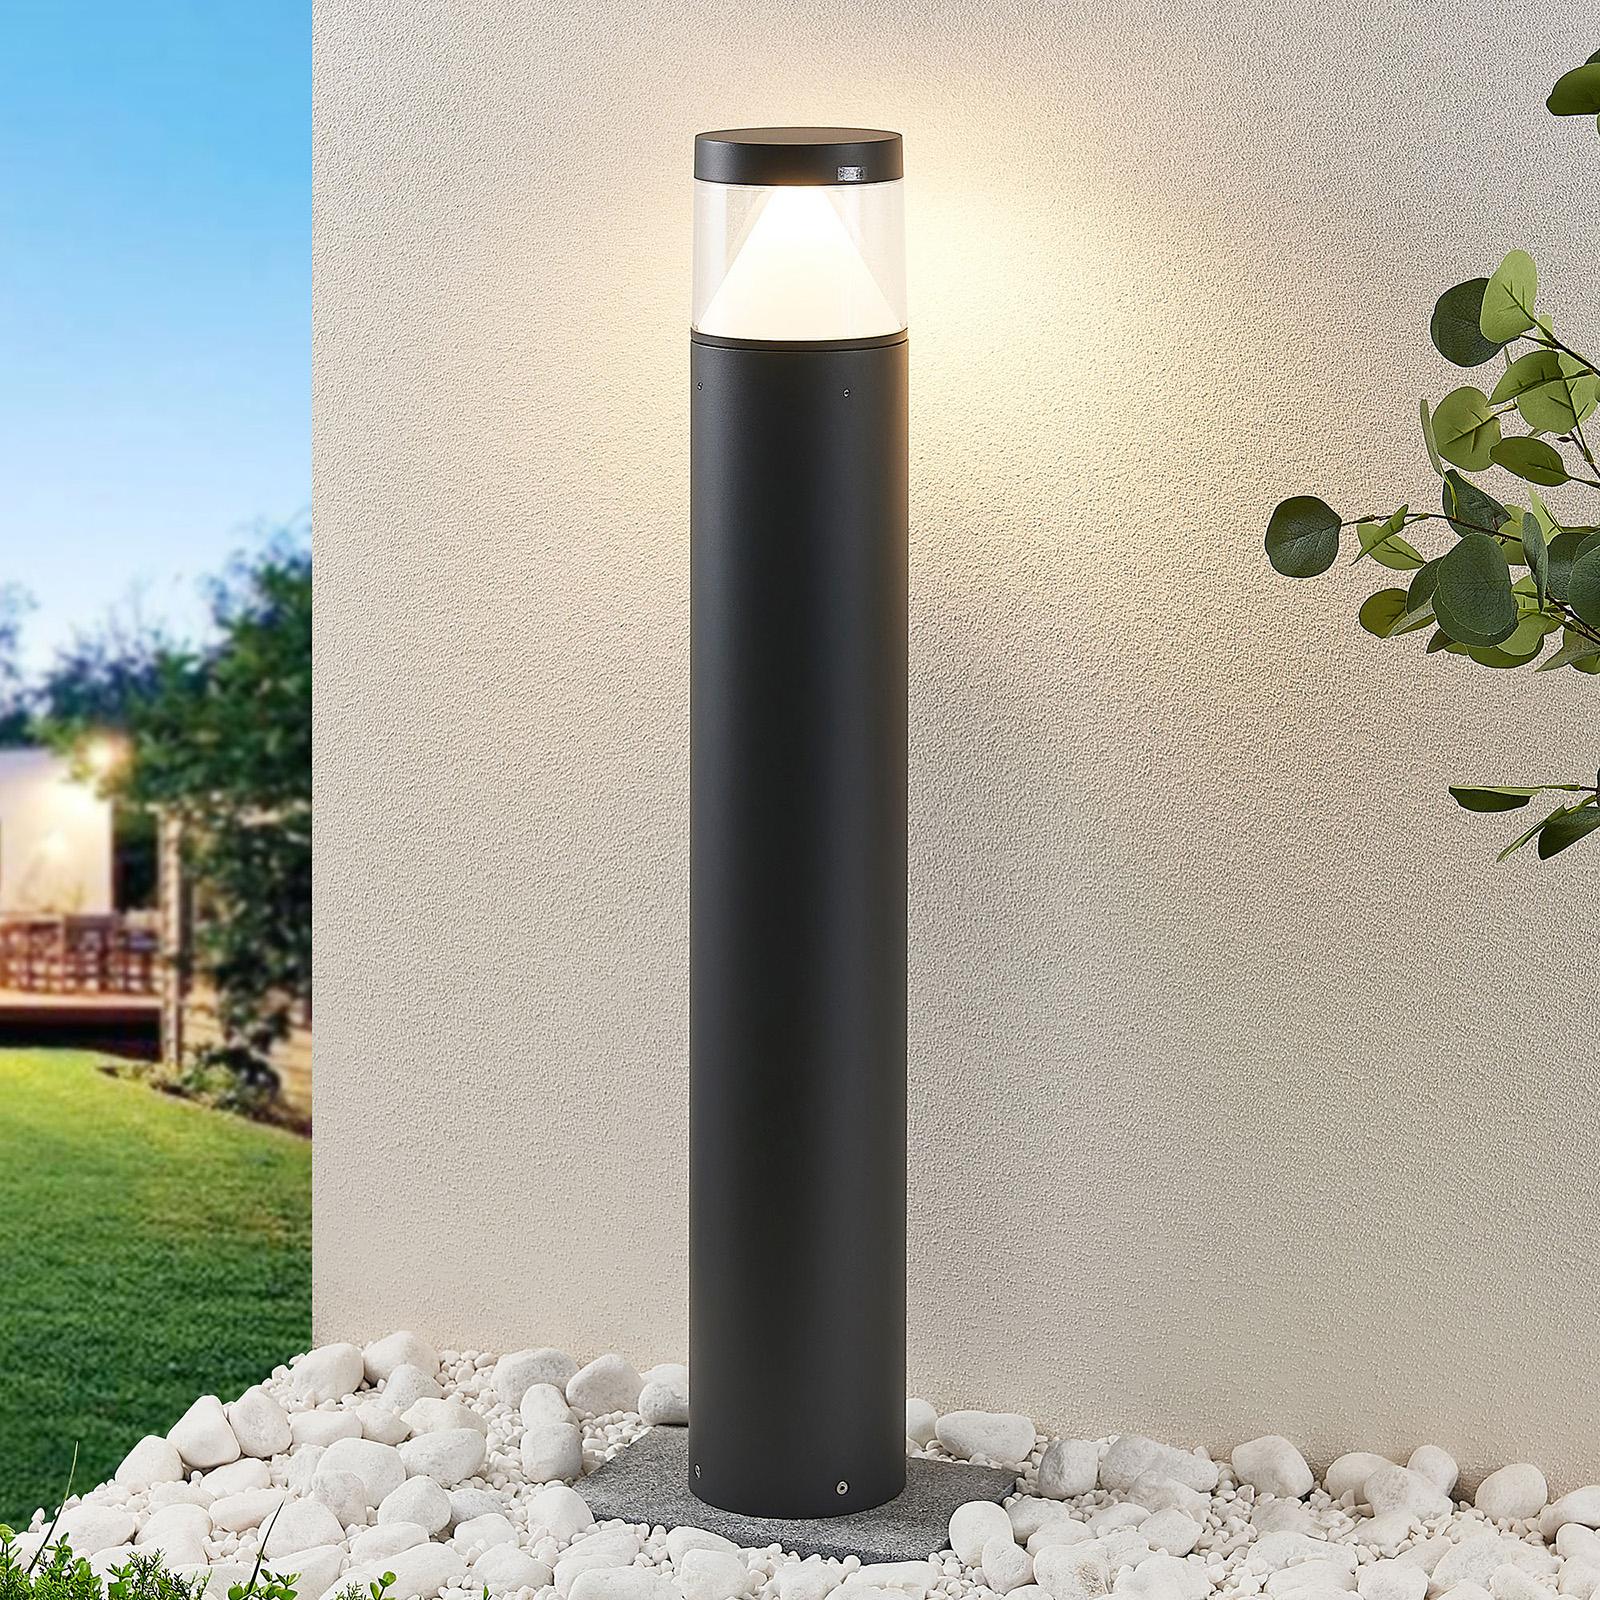 LED-pollarivalaisin Darja harmaa alumiini 100 cm